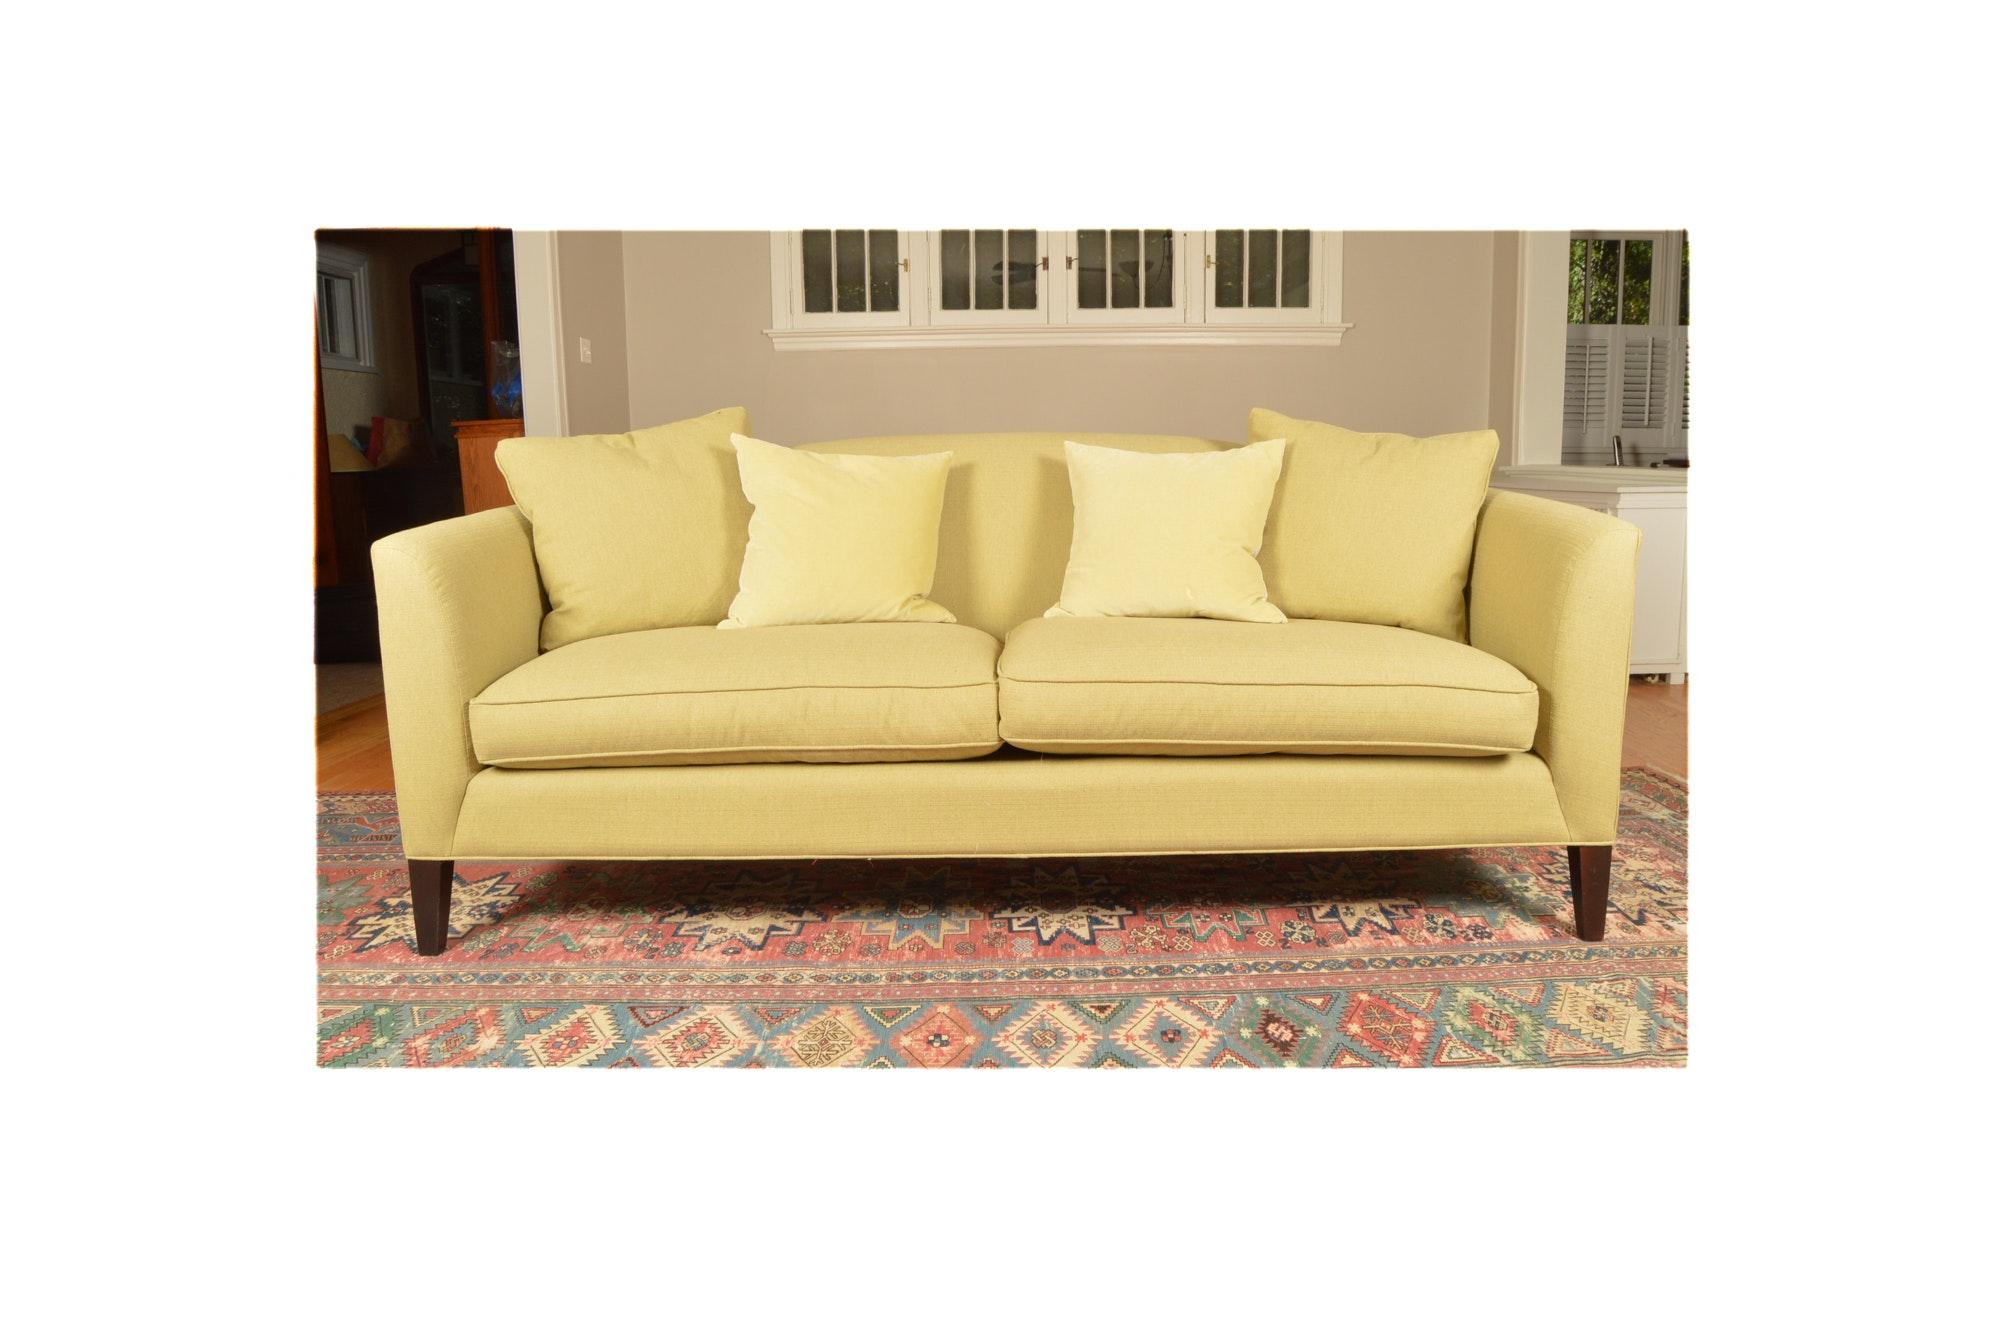 Contemporary Sofa by Room & Board